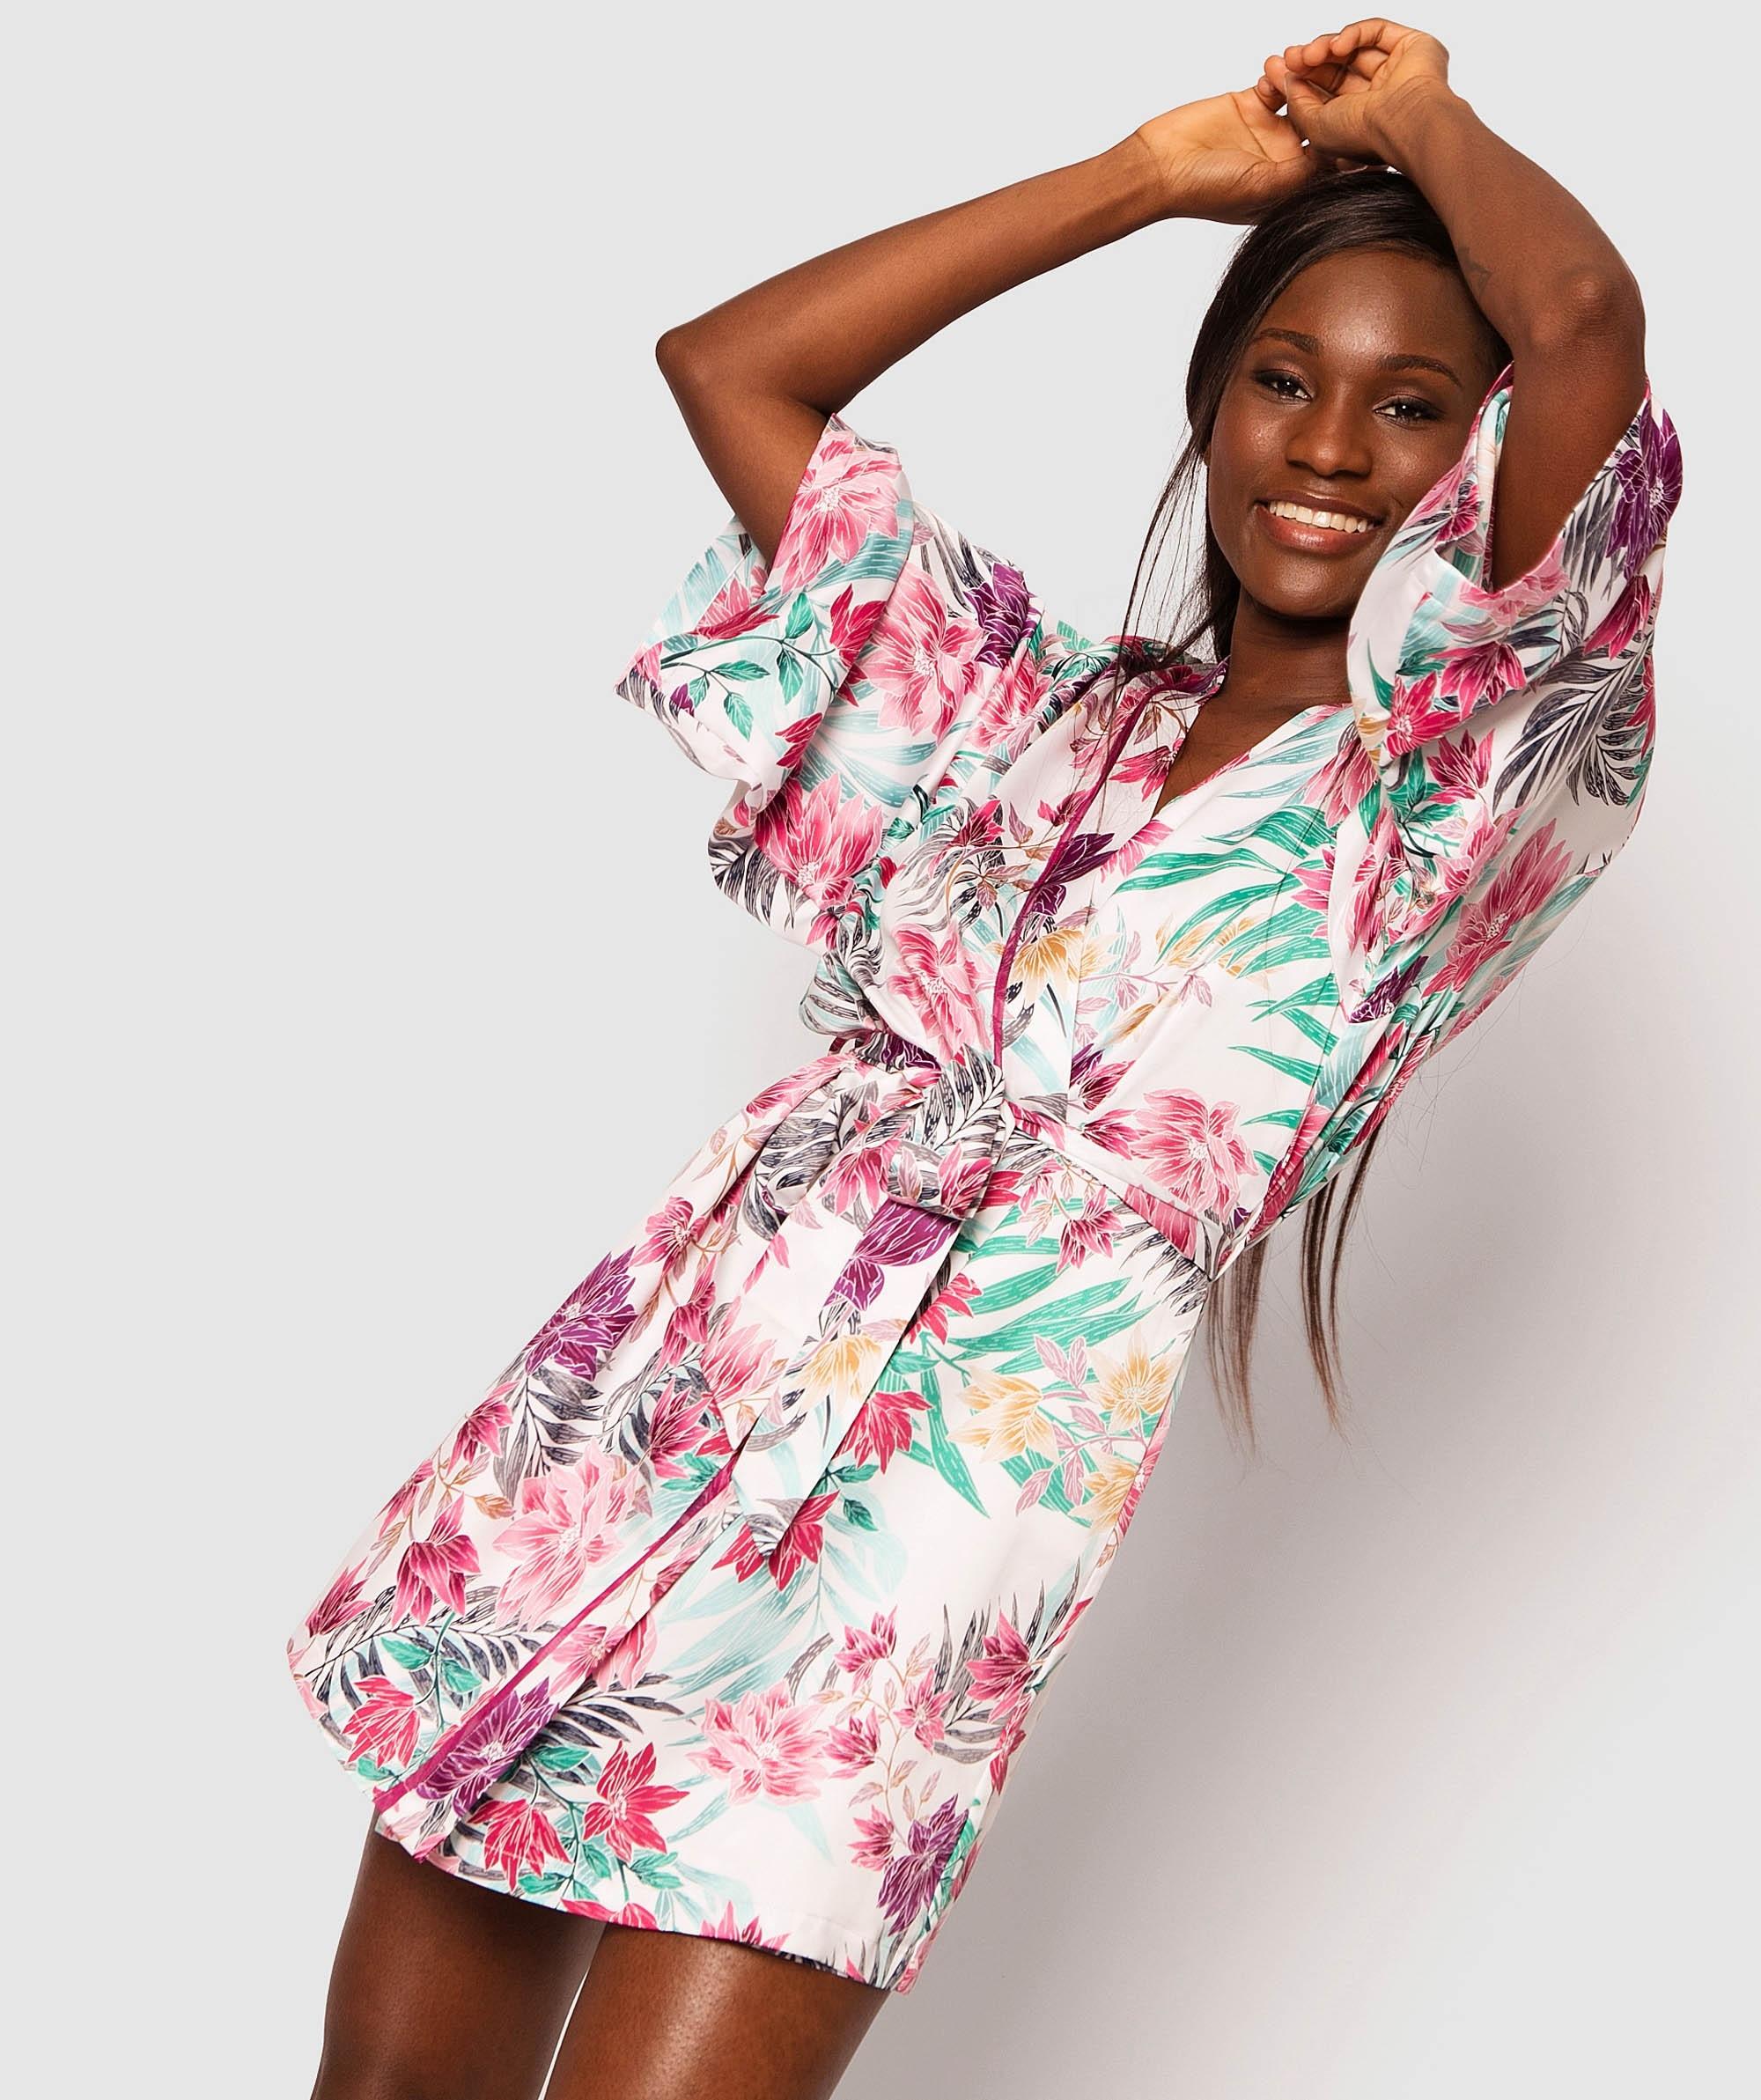 Fuchsia Dreams Short Wraps - Floral Print